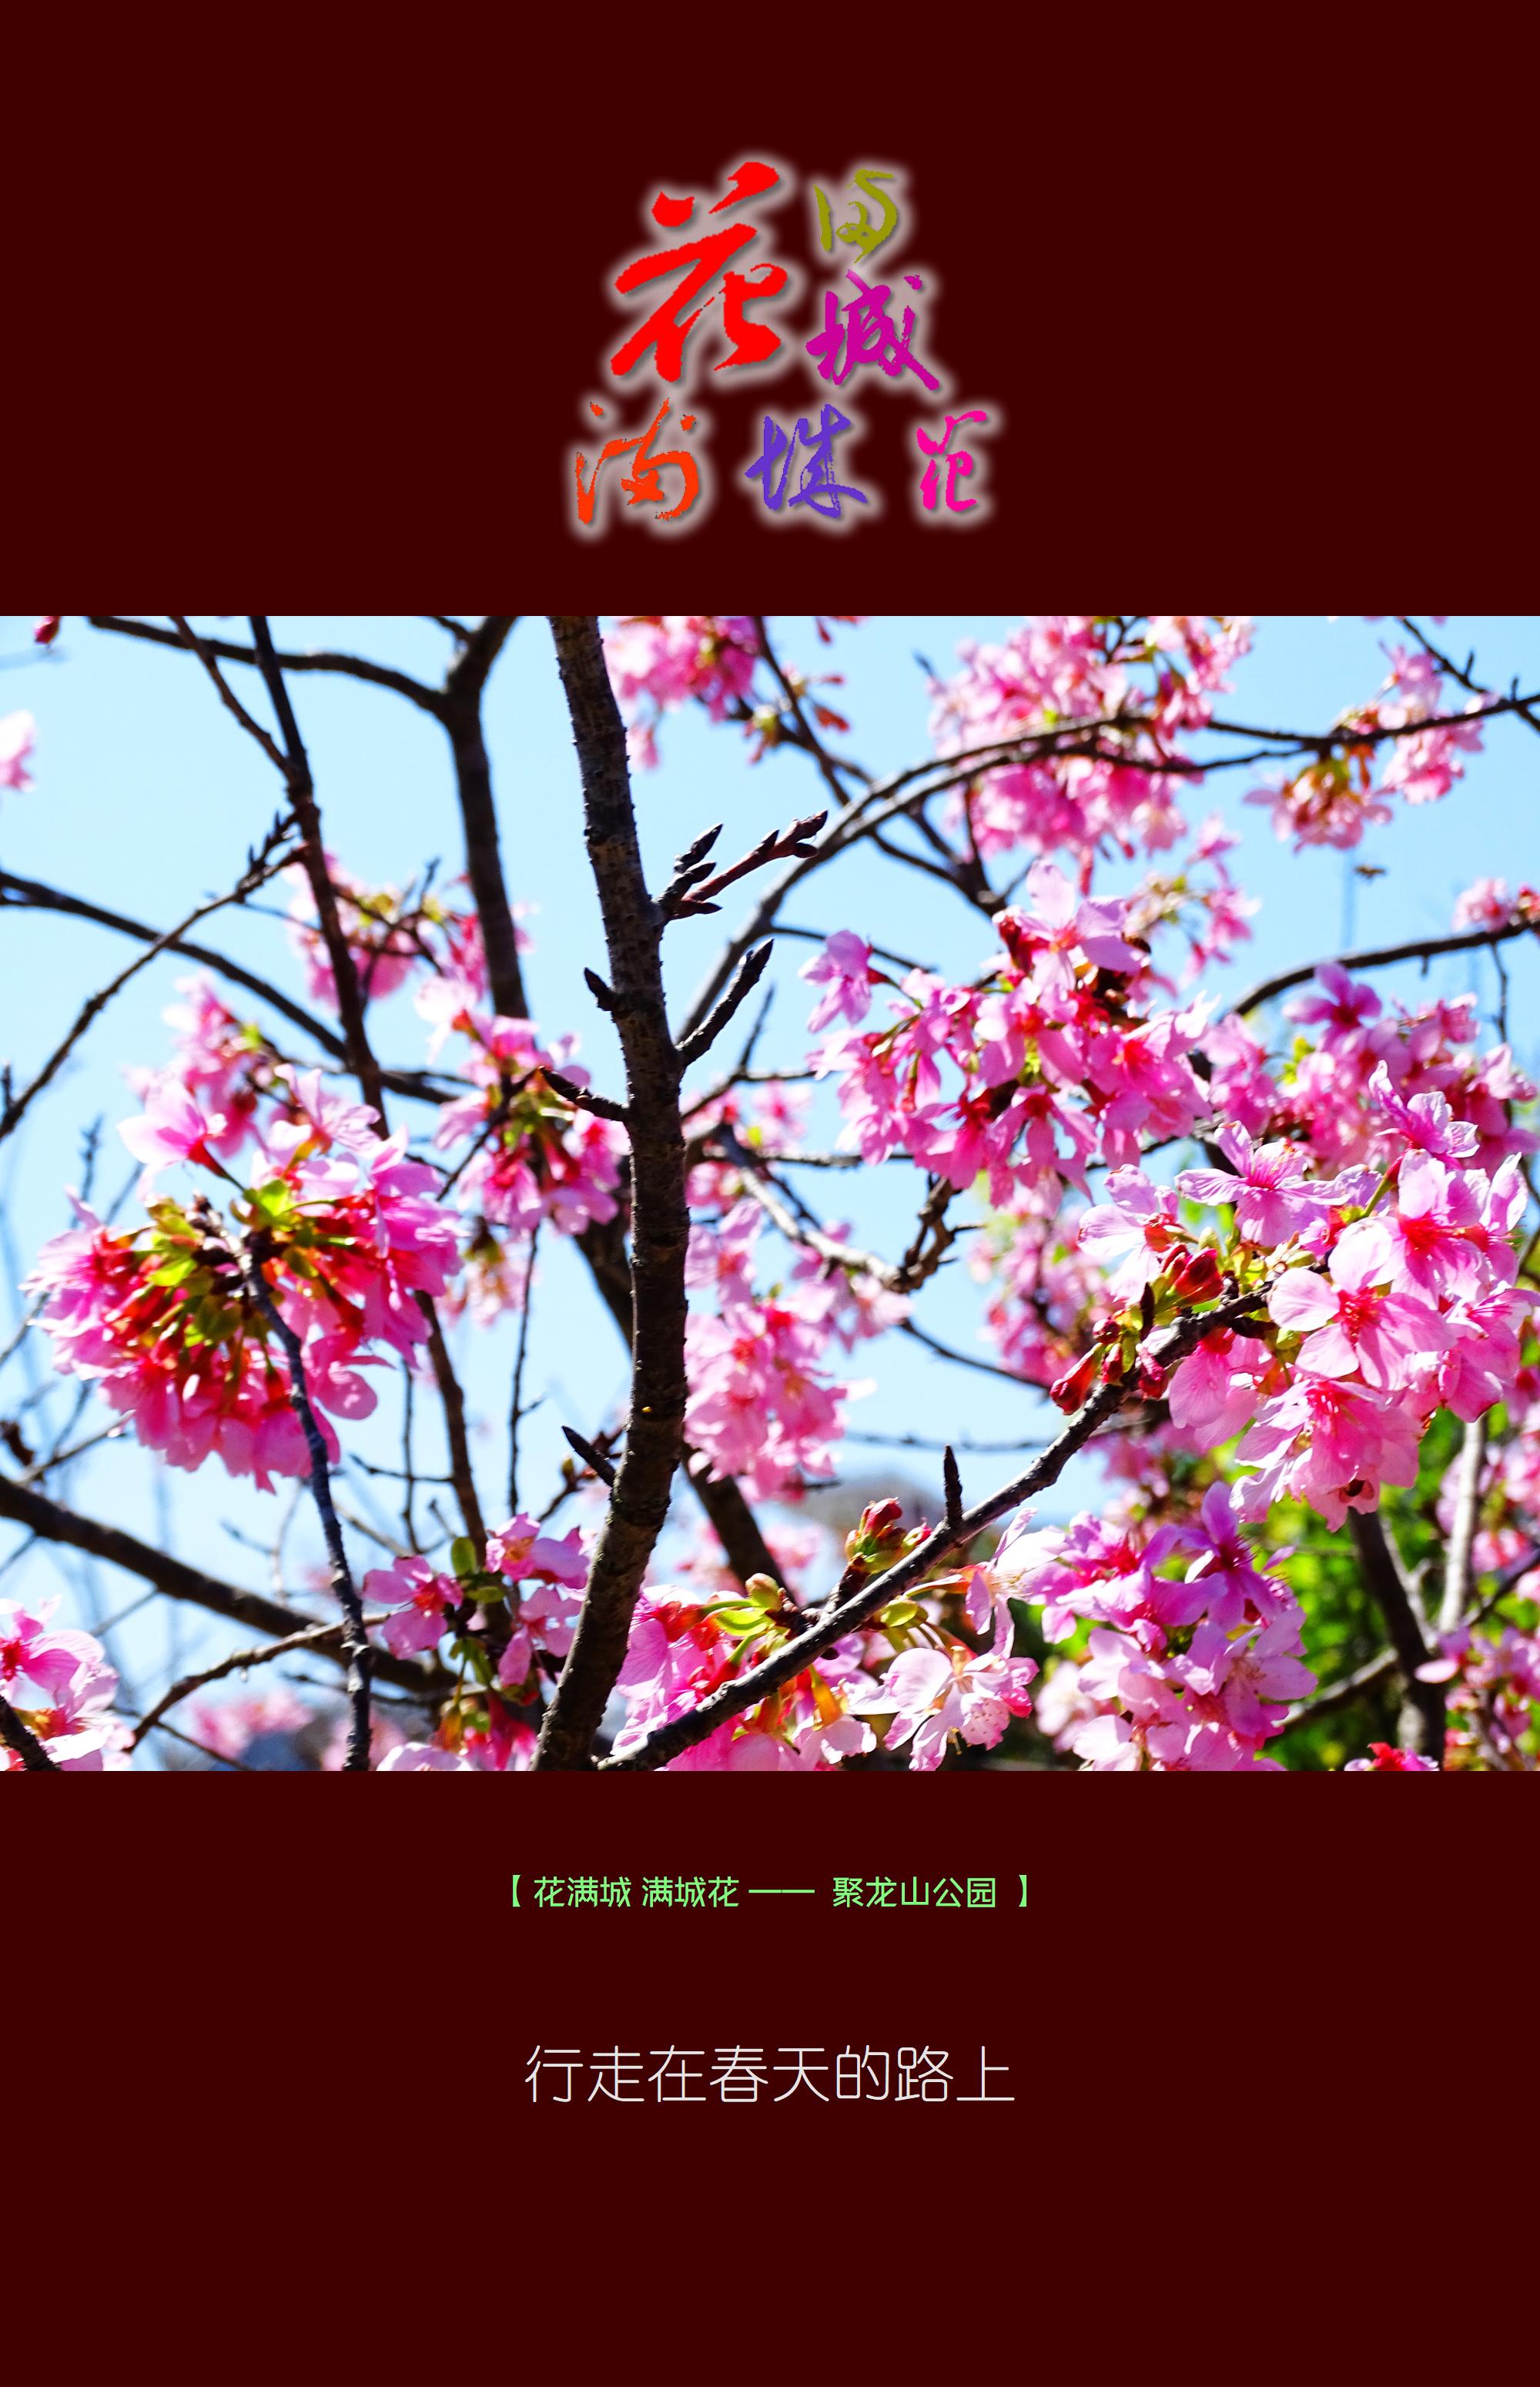 DSC02381 聚龙山.jpg